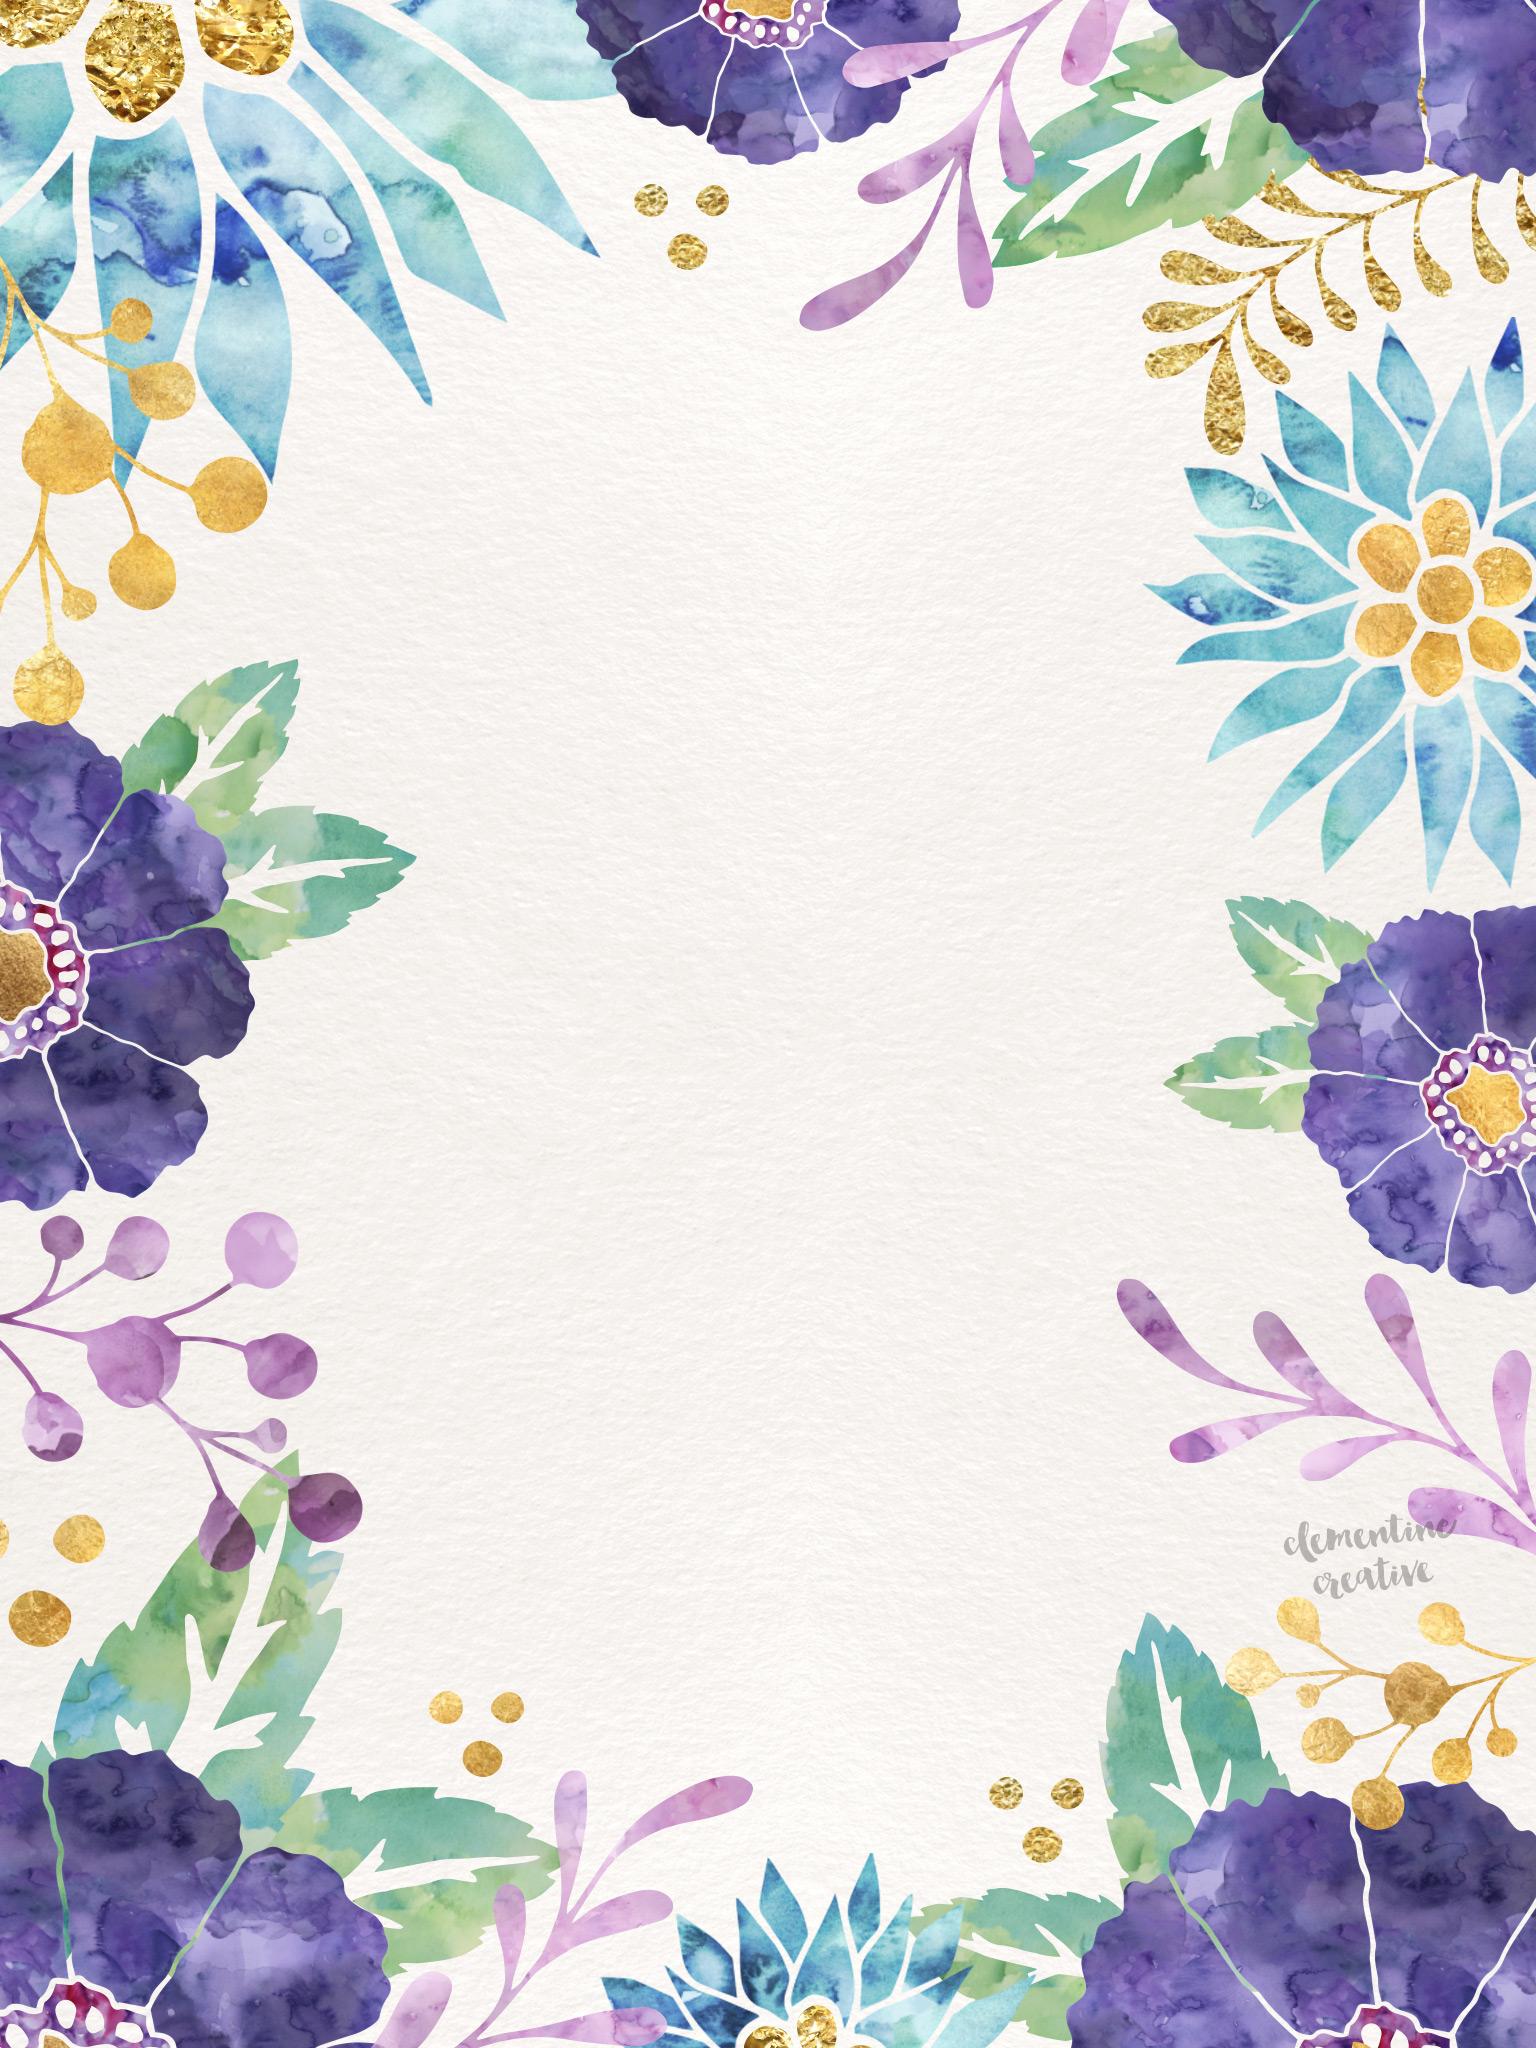 free wallpaper downloads  u2013 secret garden